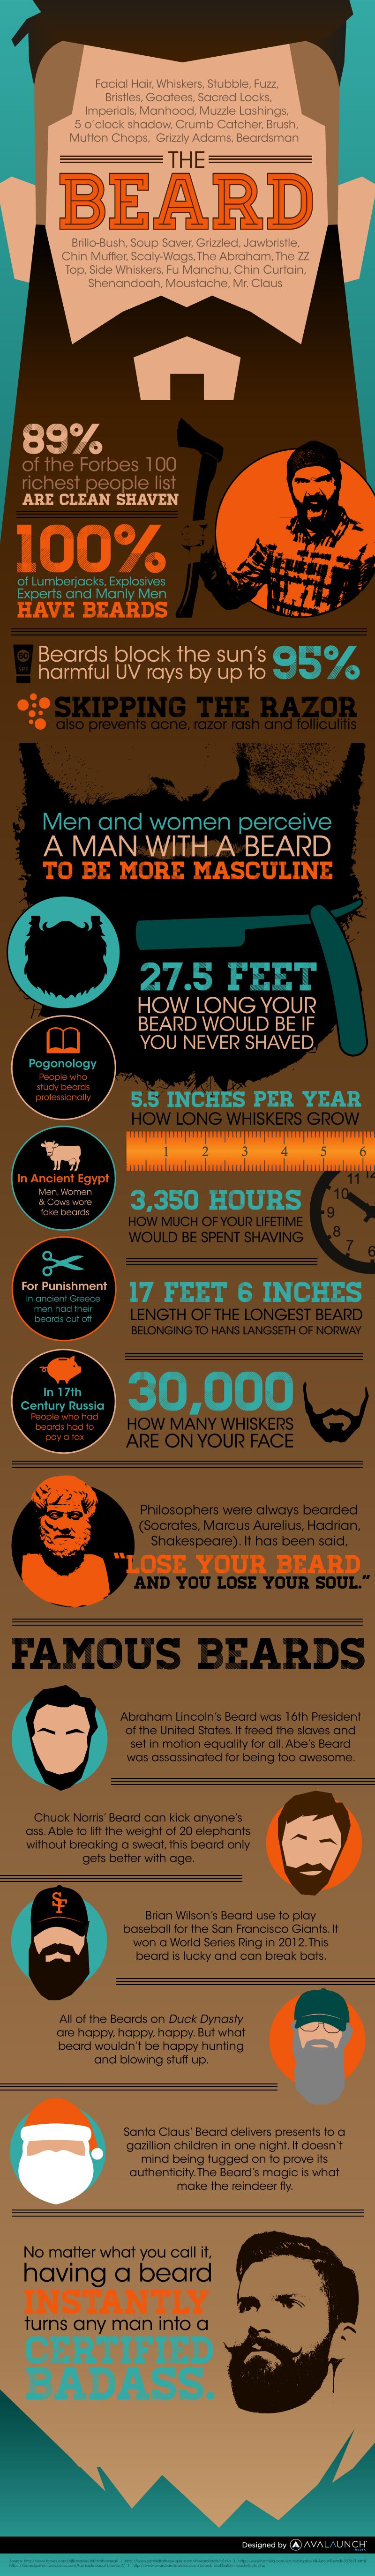 The Beard Infographic